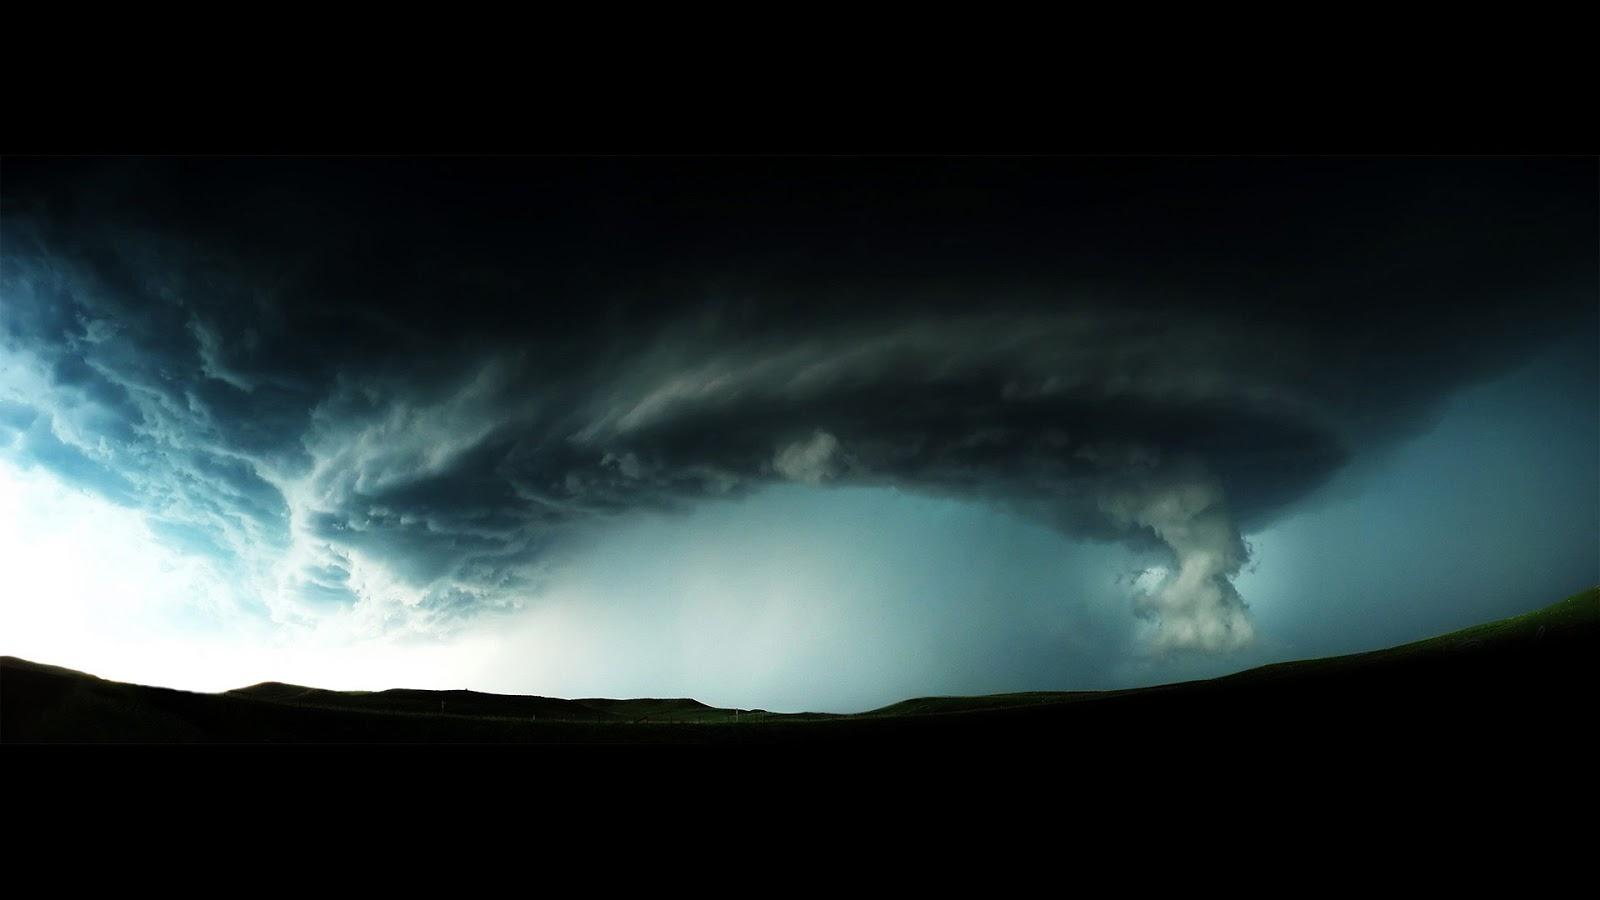 cyclone - photo #47